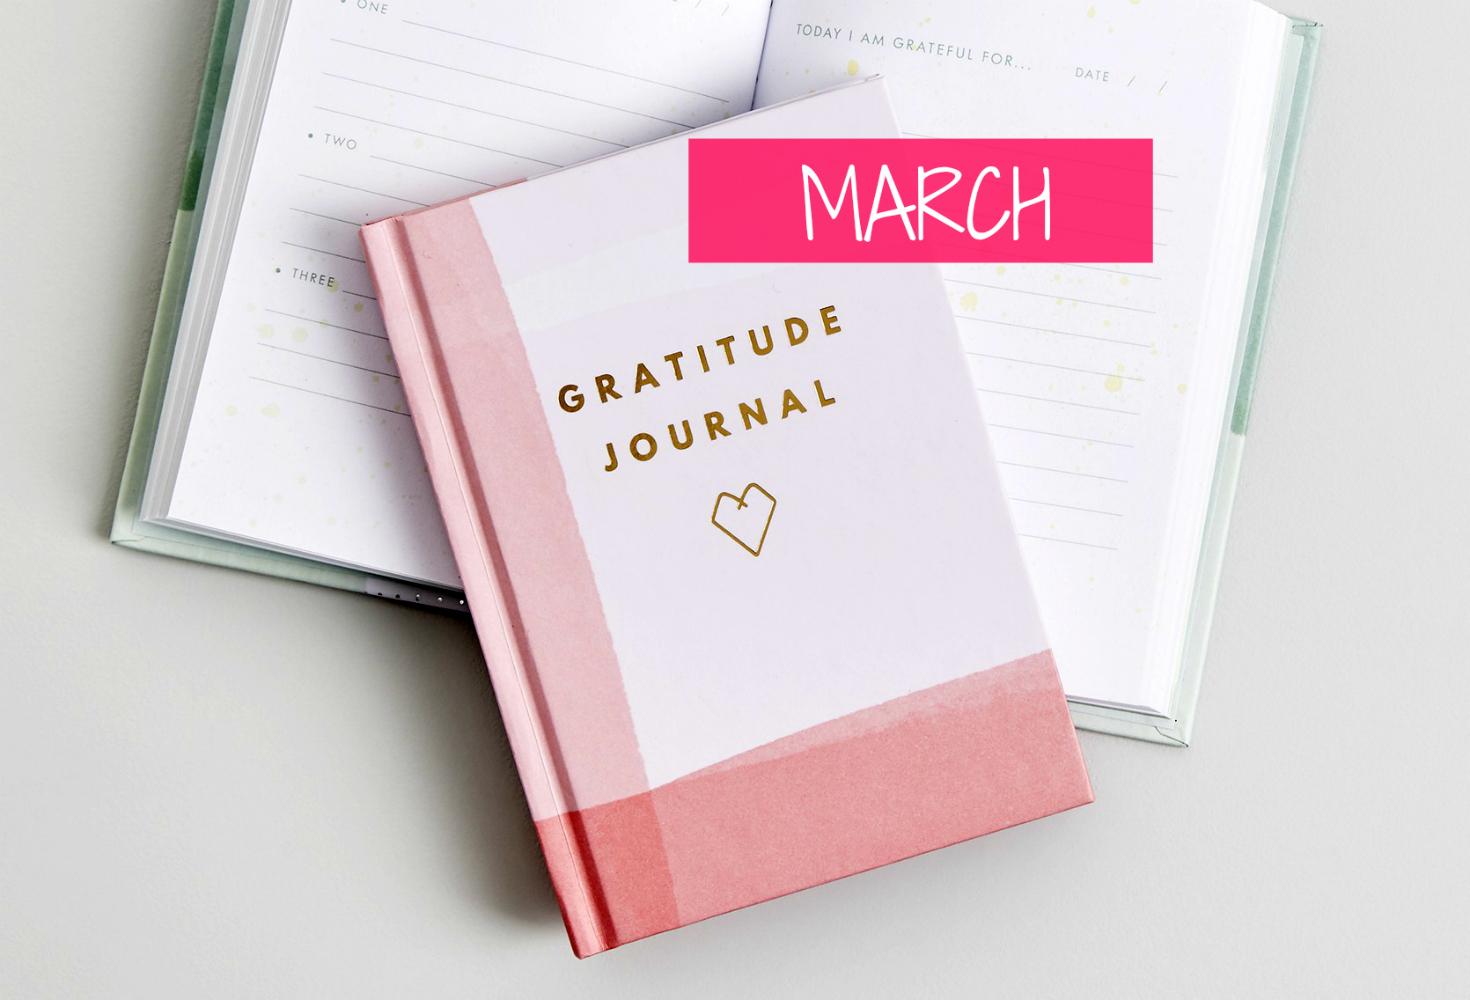 gratitude journal march chanelle hayley